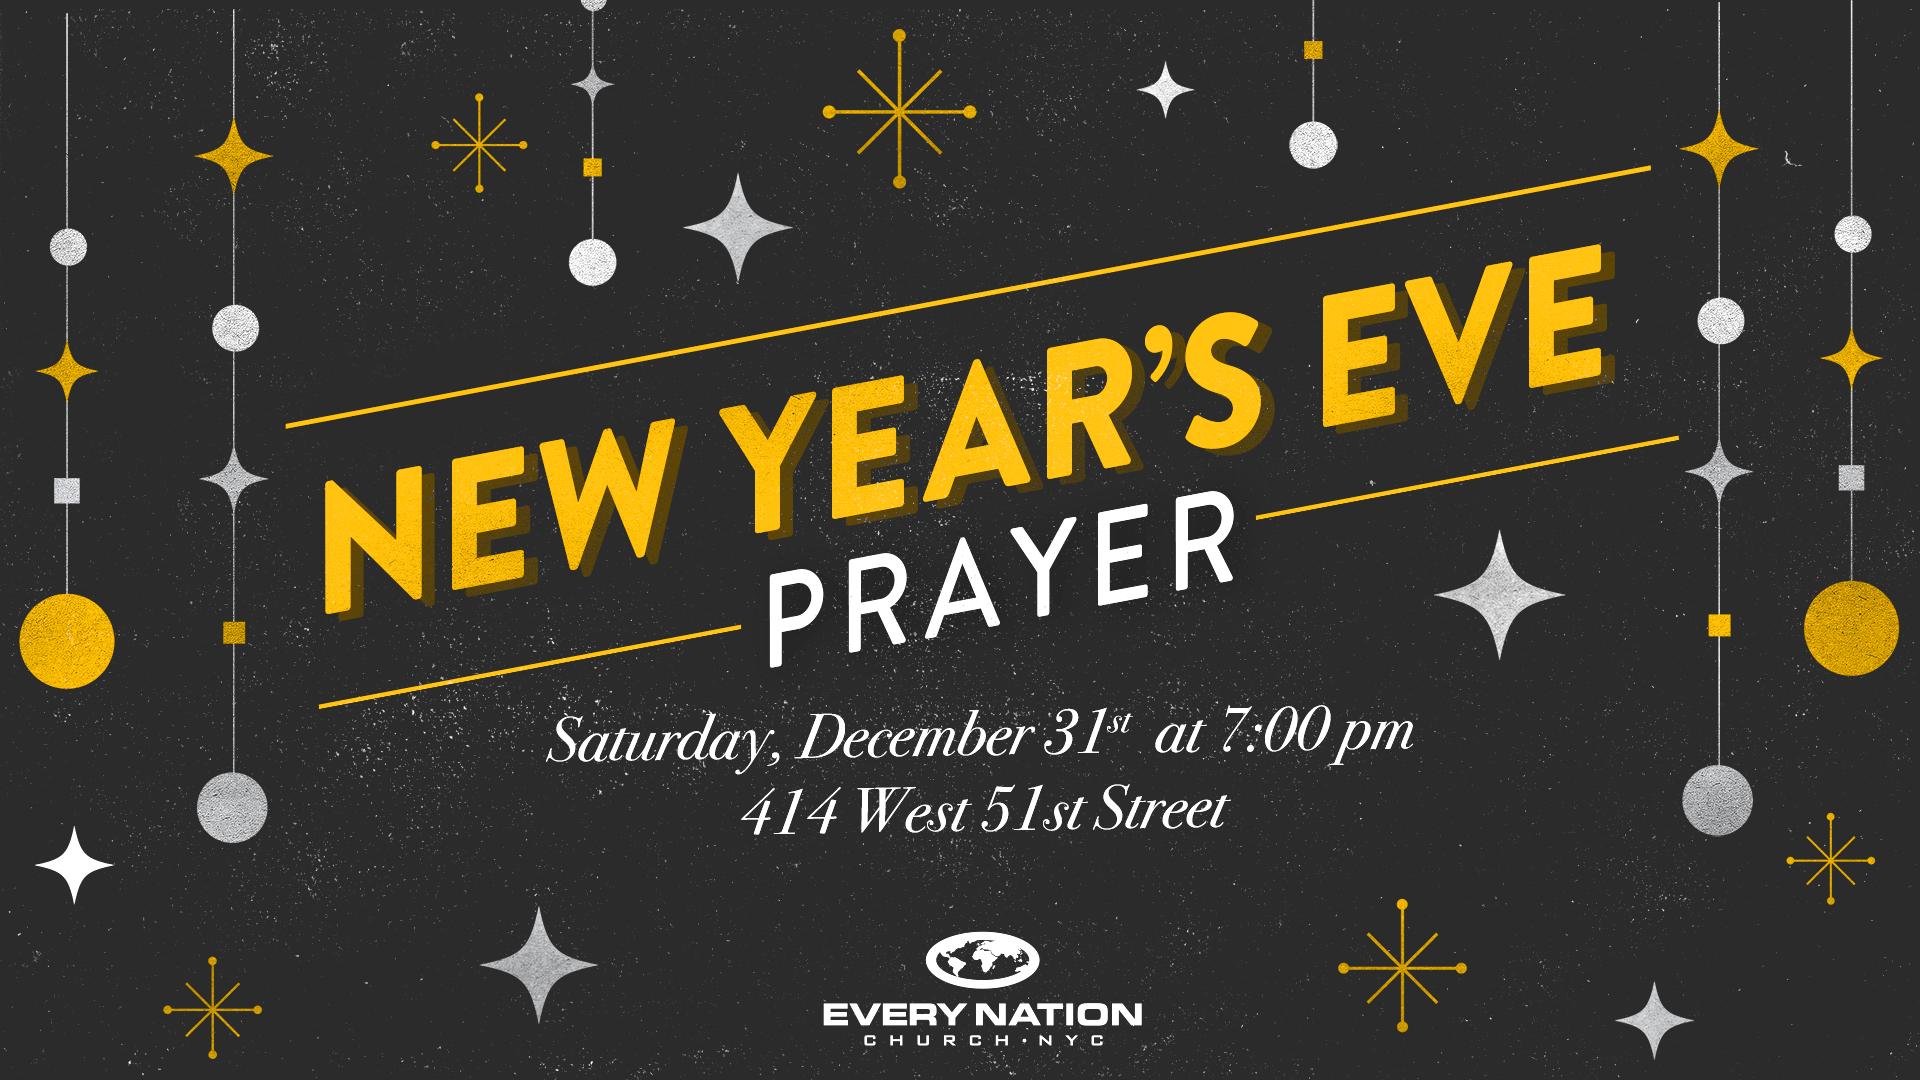 New Years Eve Prayer | - Every Nation Church, New York